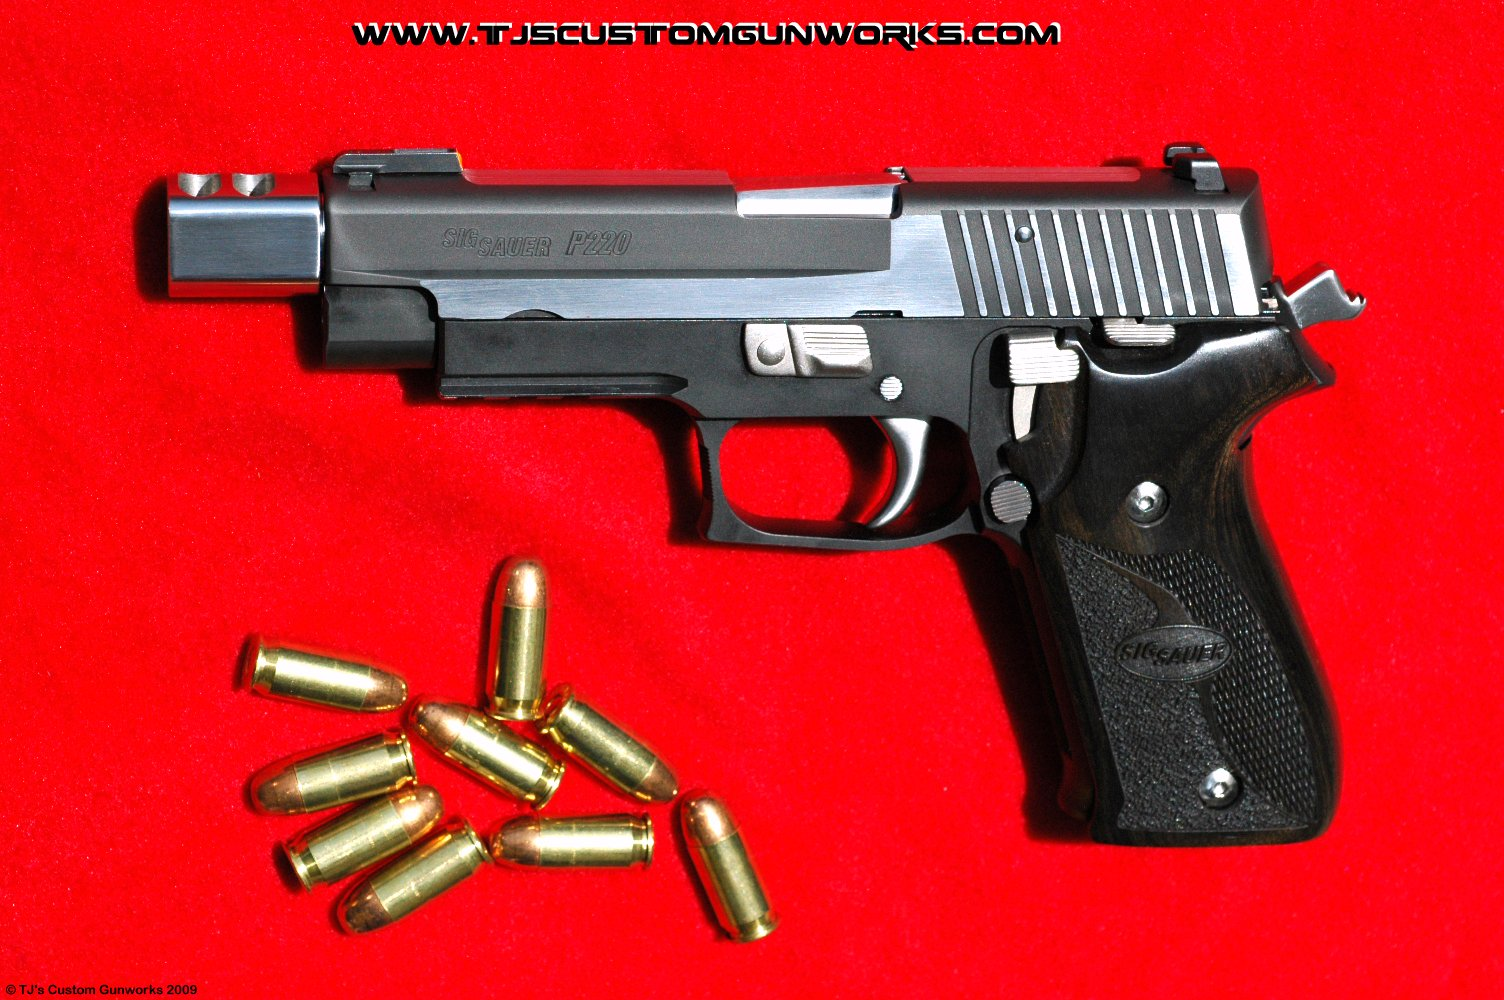 Custom Sig Sauer P220 Equinox With Tjs Sig Comp Compensator